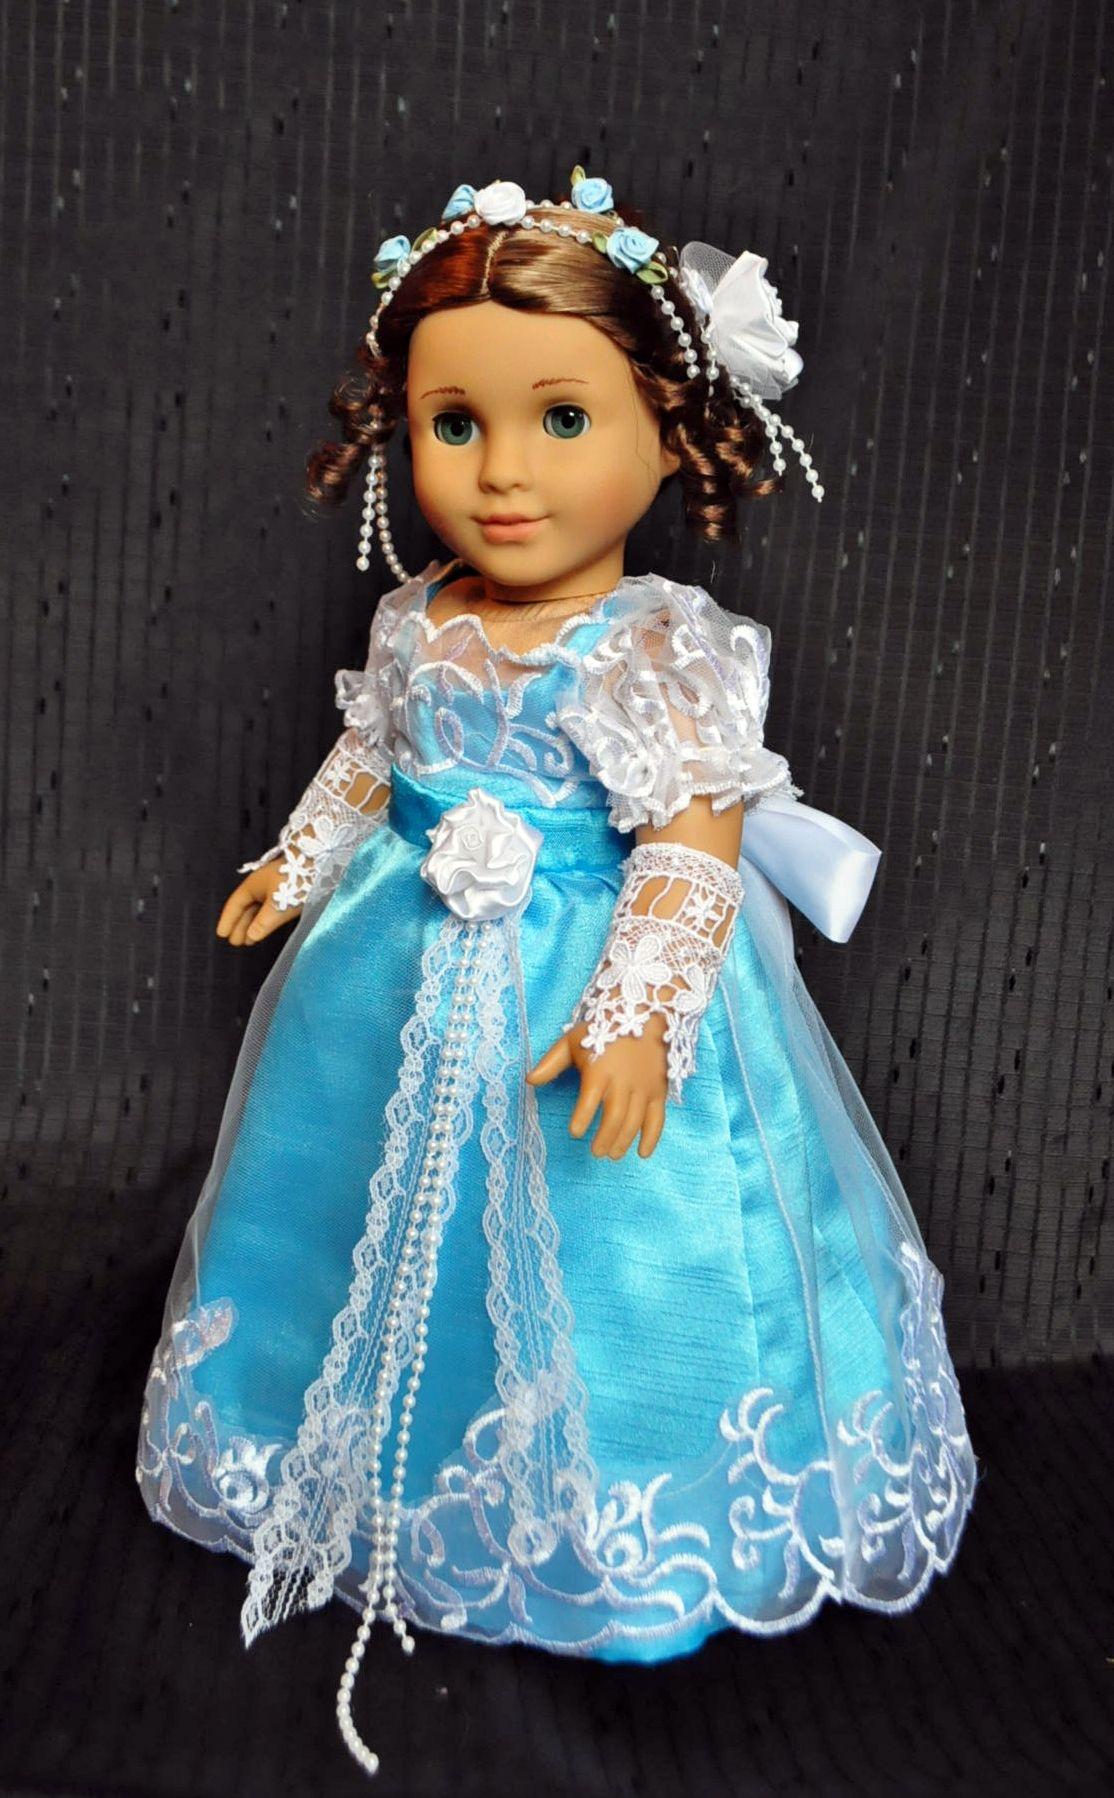 Regency -- SOLD | poupées | Pinterest | Puppen und Nähen